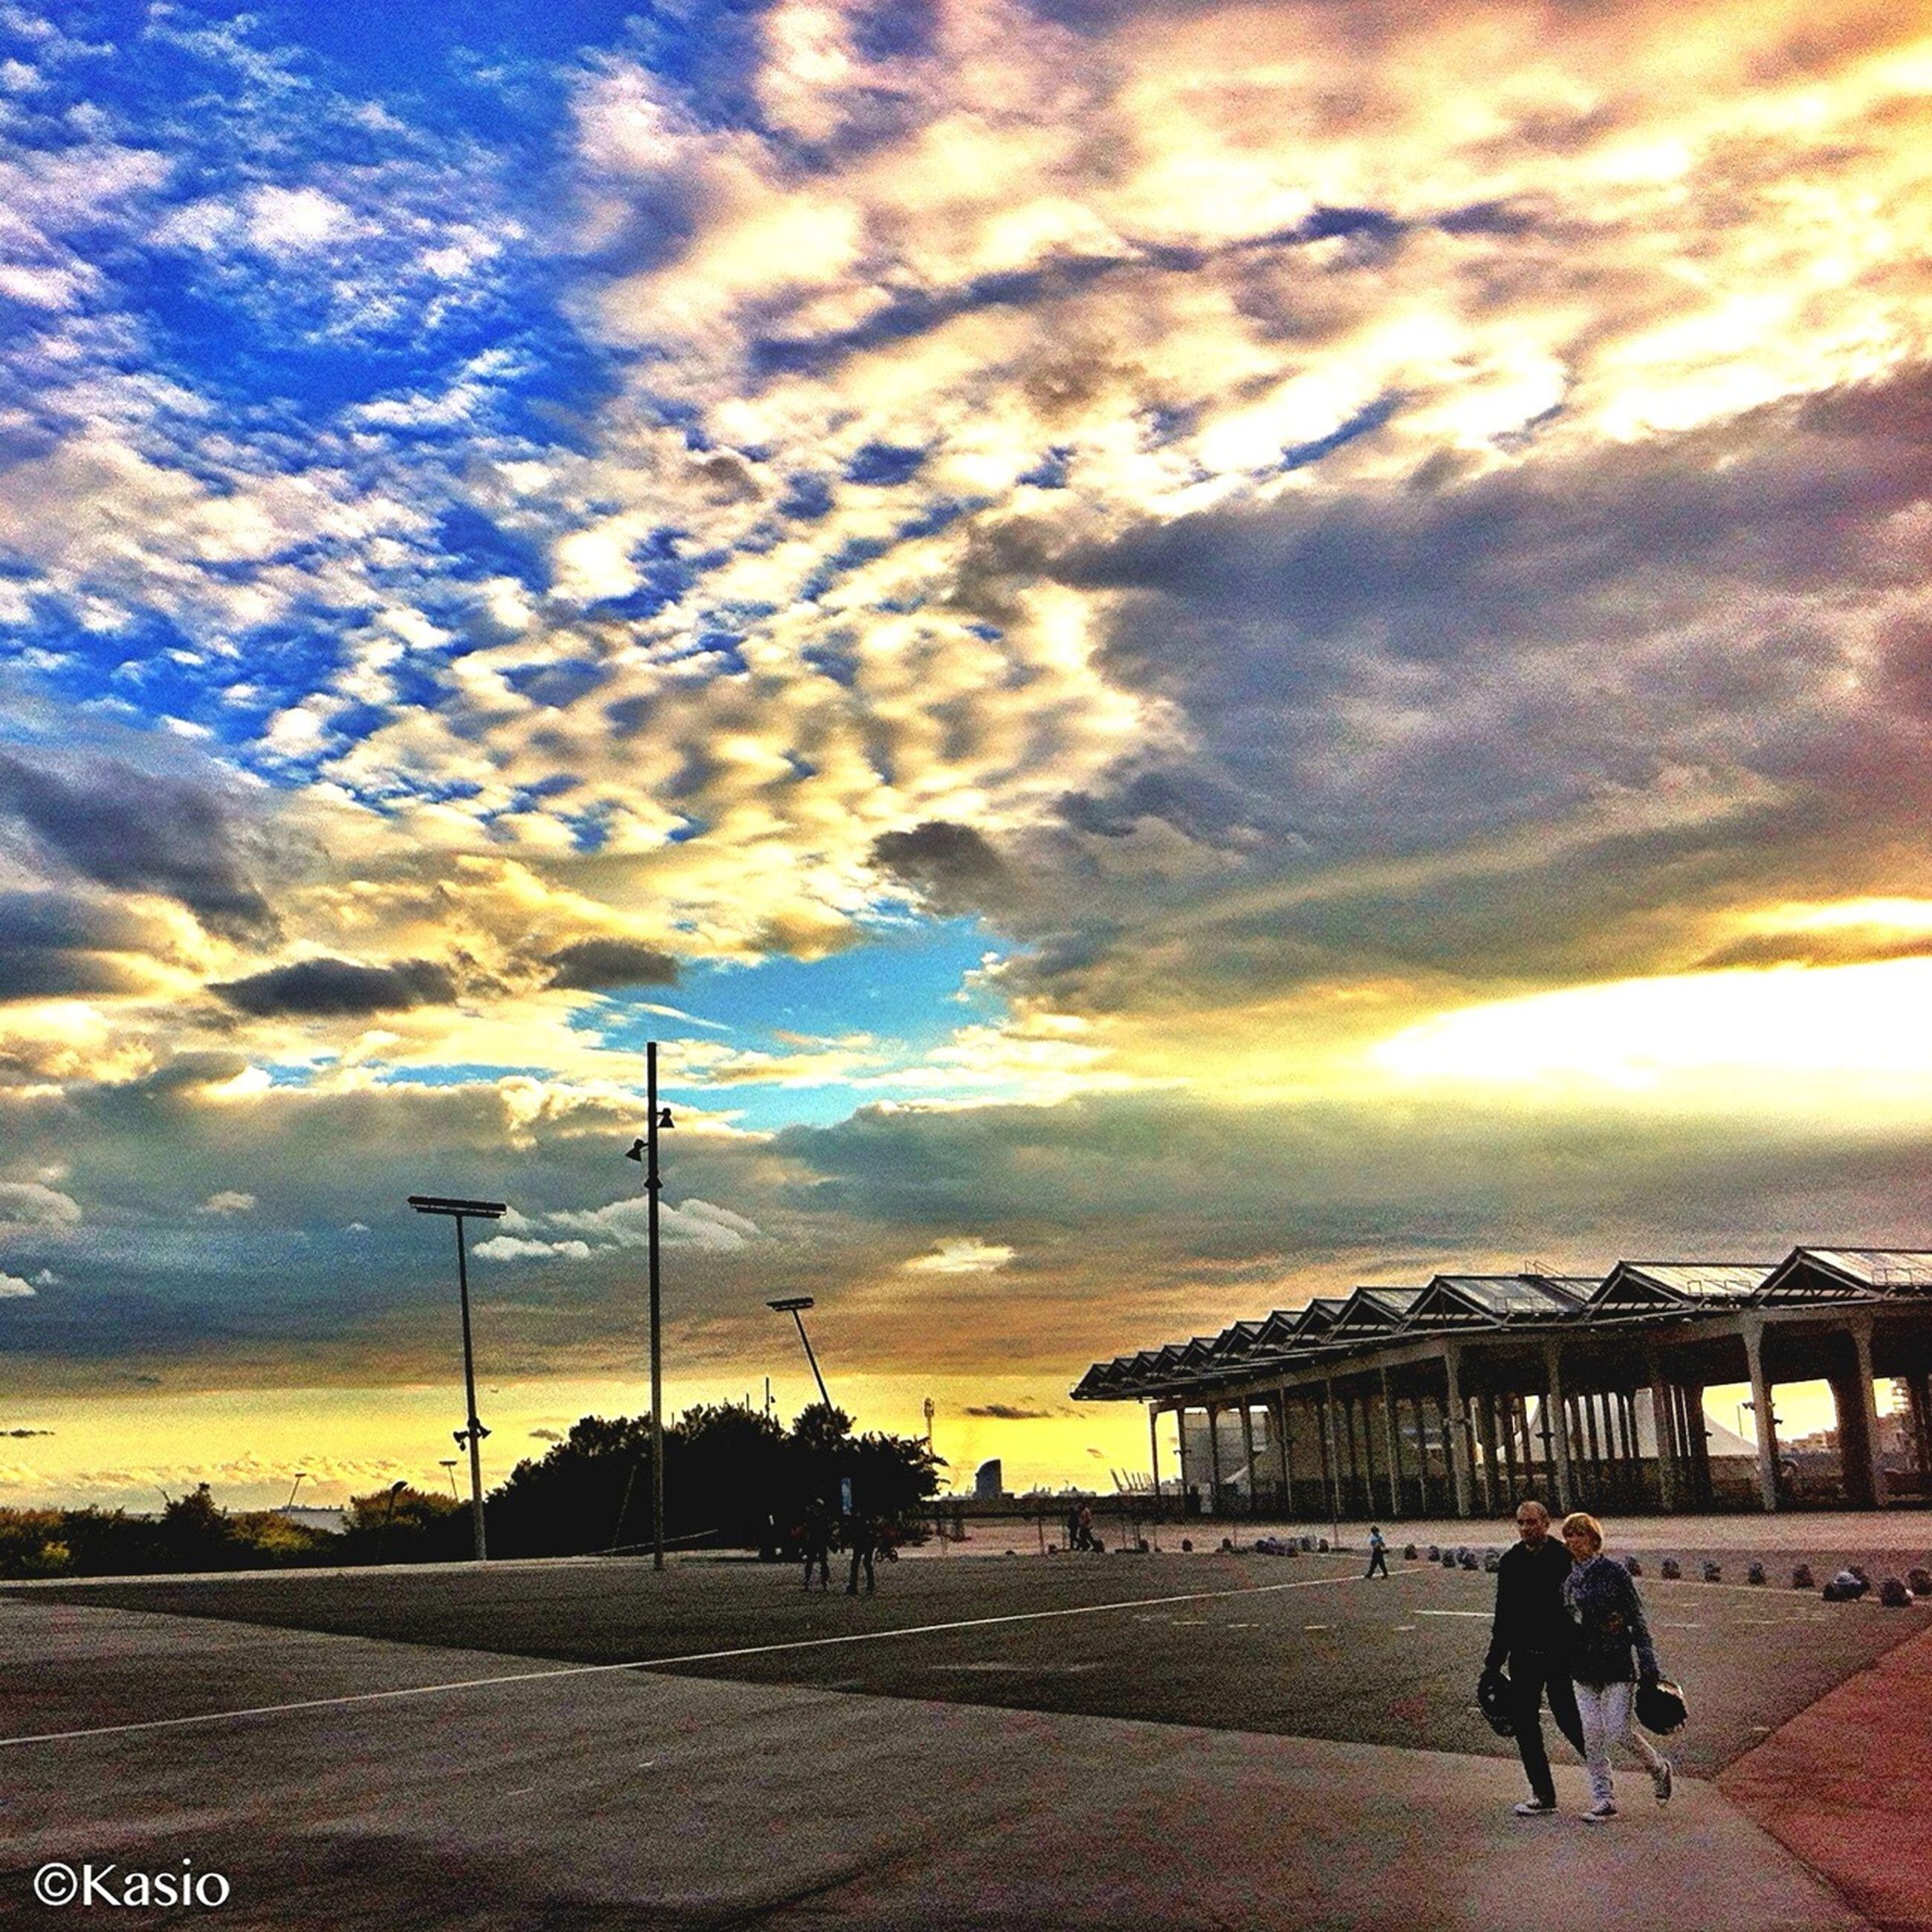 sky, sunset, cloud - sky, men, lifestyles, walking, full length, leisure activity, cloudy, cloud, silhouette, person, built structure, street, road, street light, standing